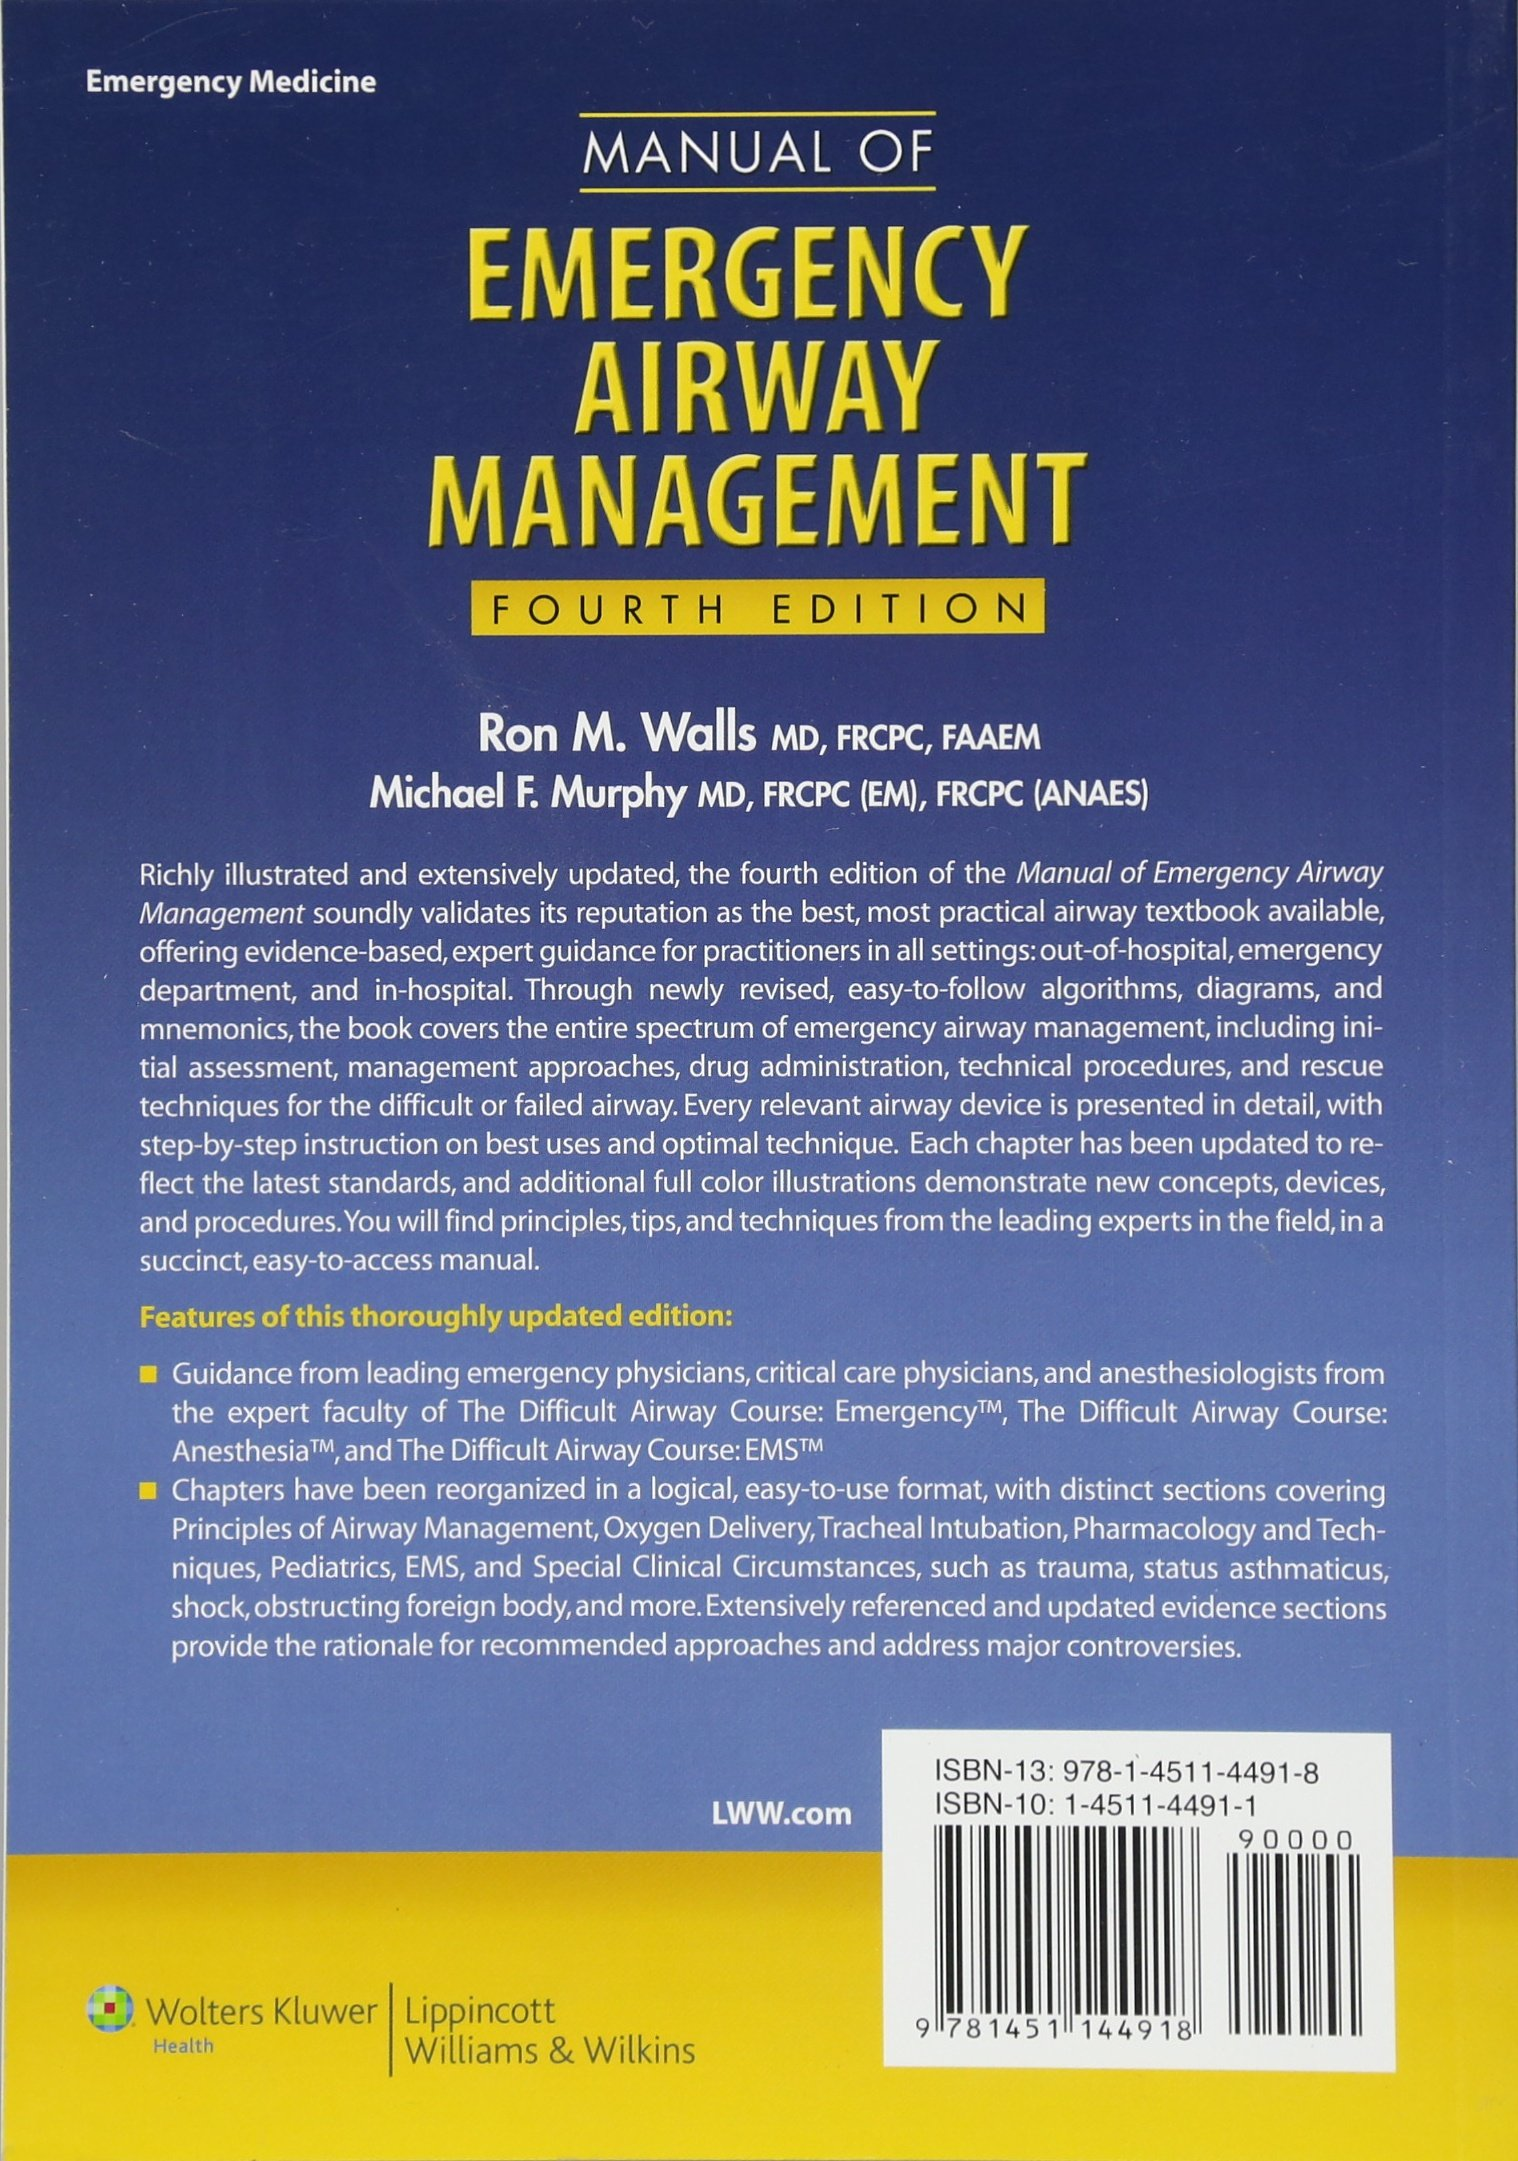 Manual of Emergency Airway Management: Amazon.co.uk: Ron Walls, Michael  Murphy: 9781451144918: Books